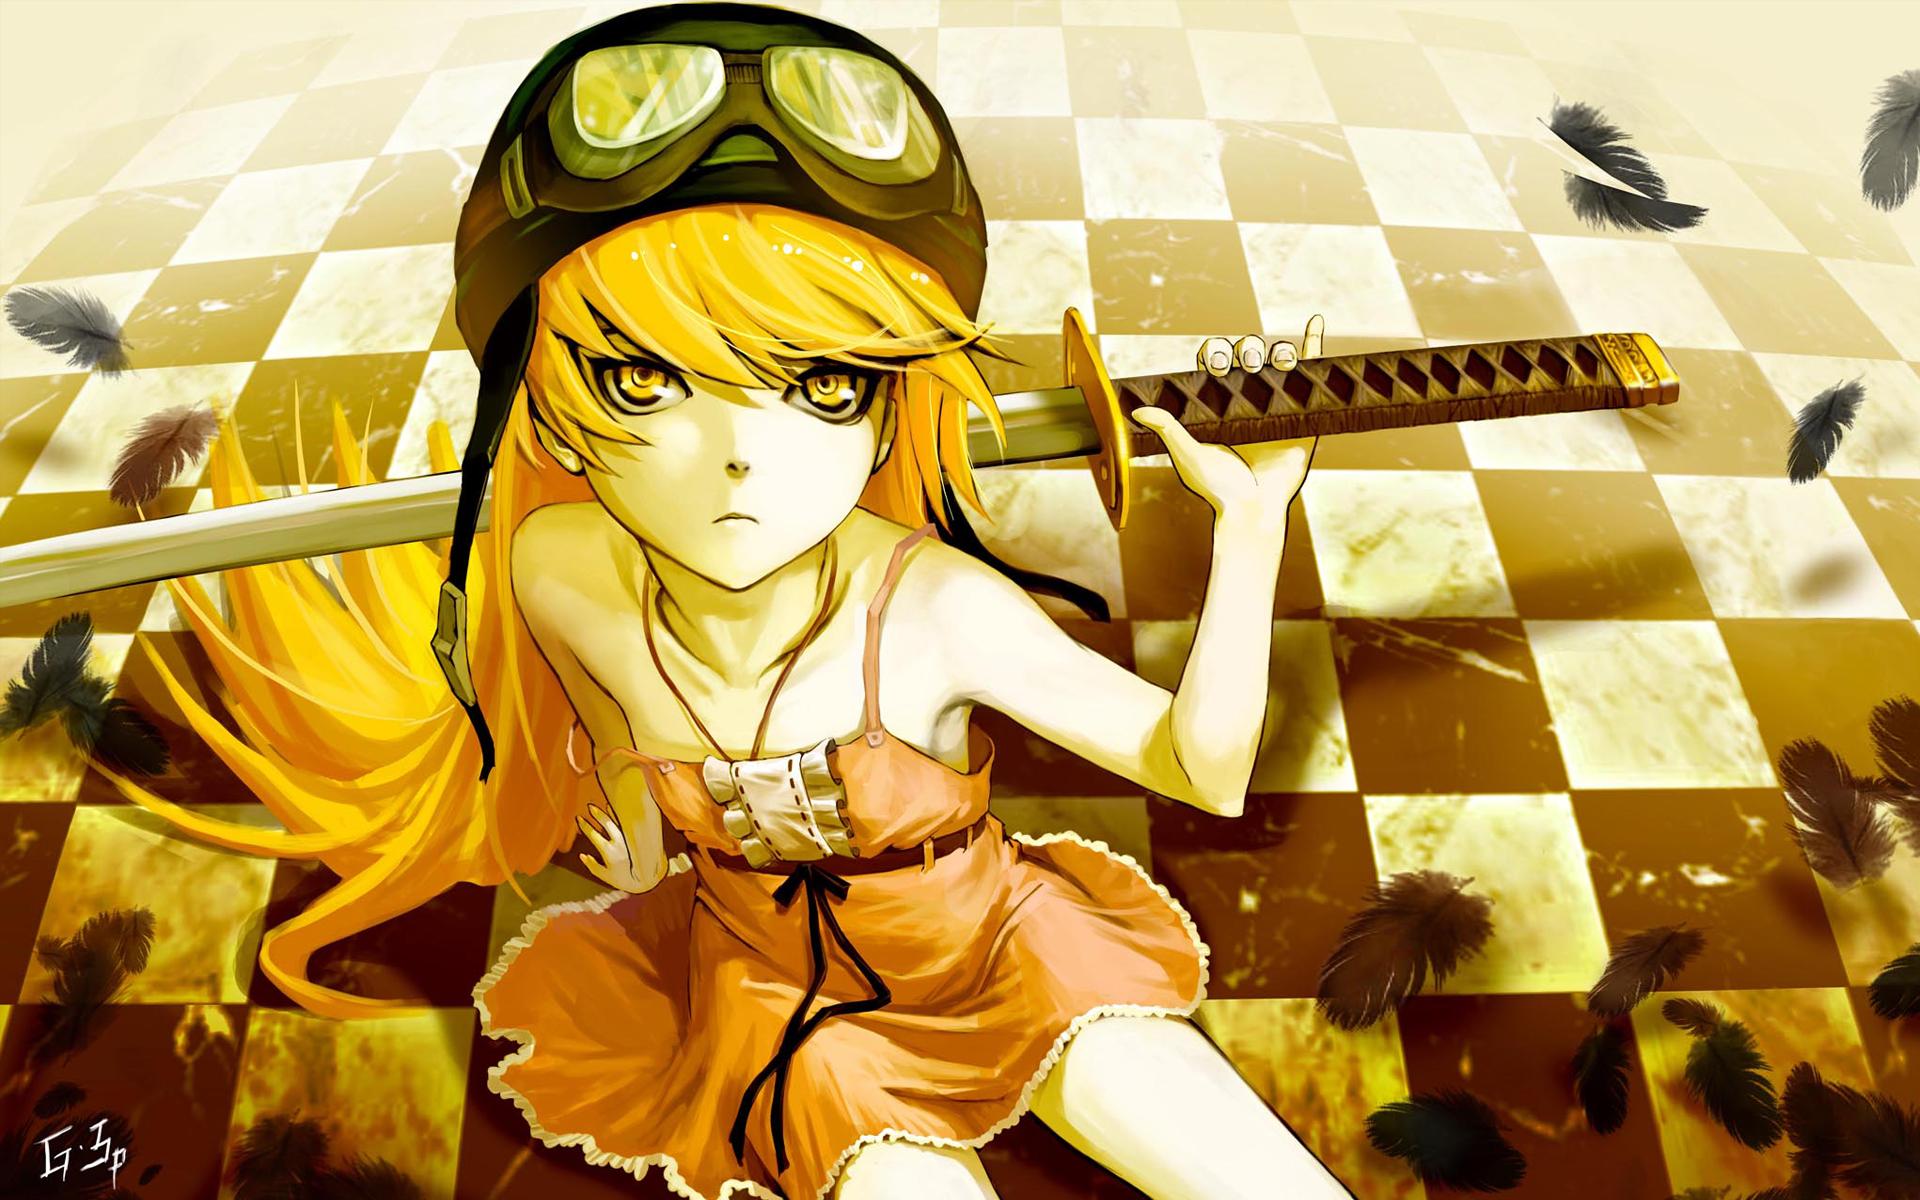 100 Wallpapers de anime HD 5299_1_other_anime_hd_wallpapers_anime_girls_sword